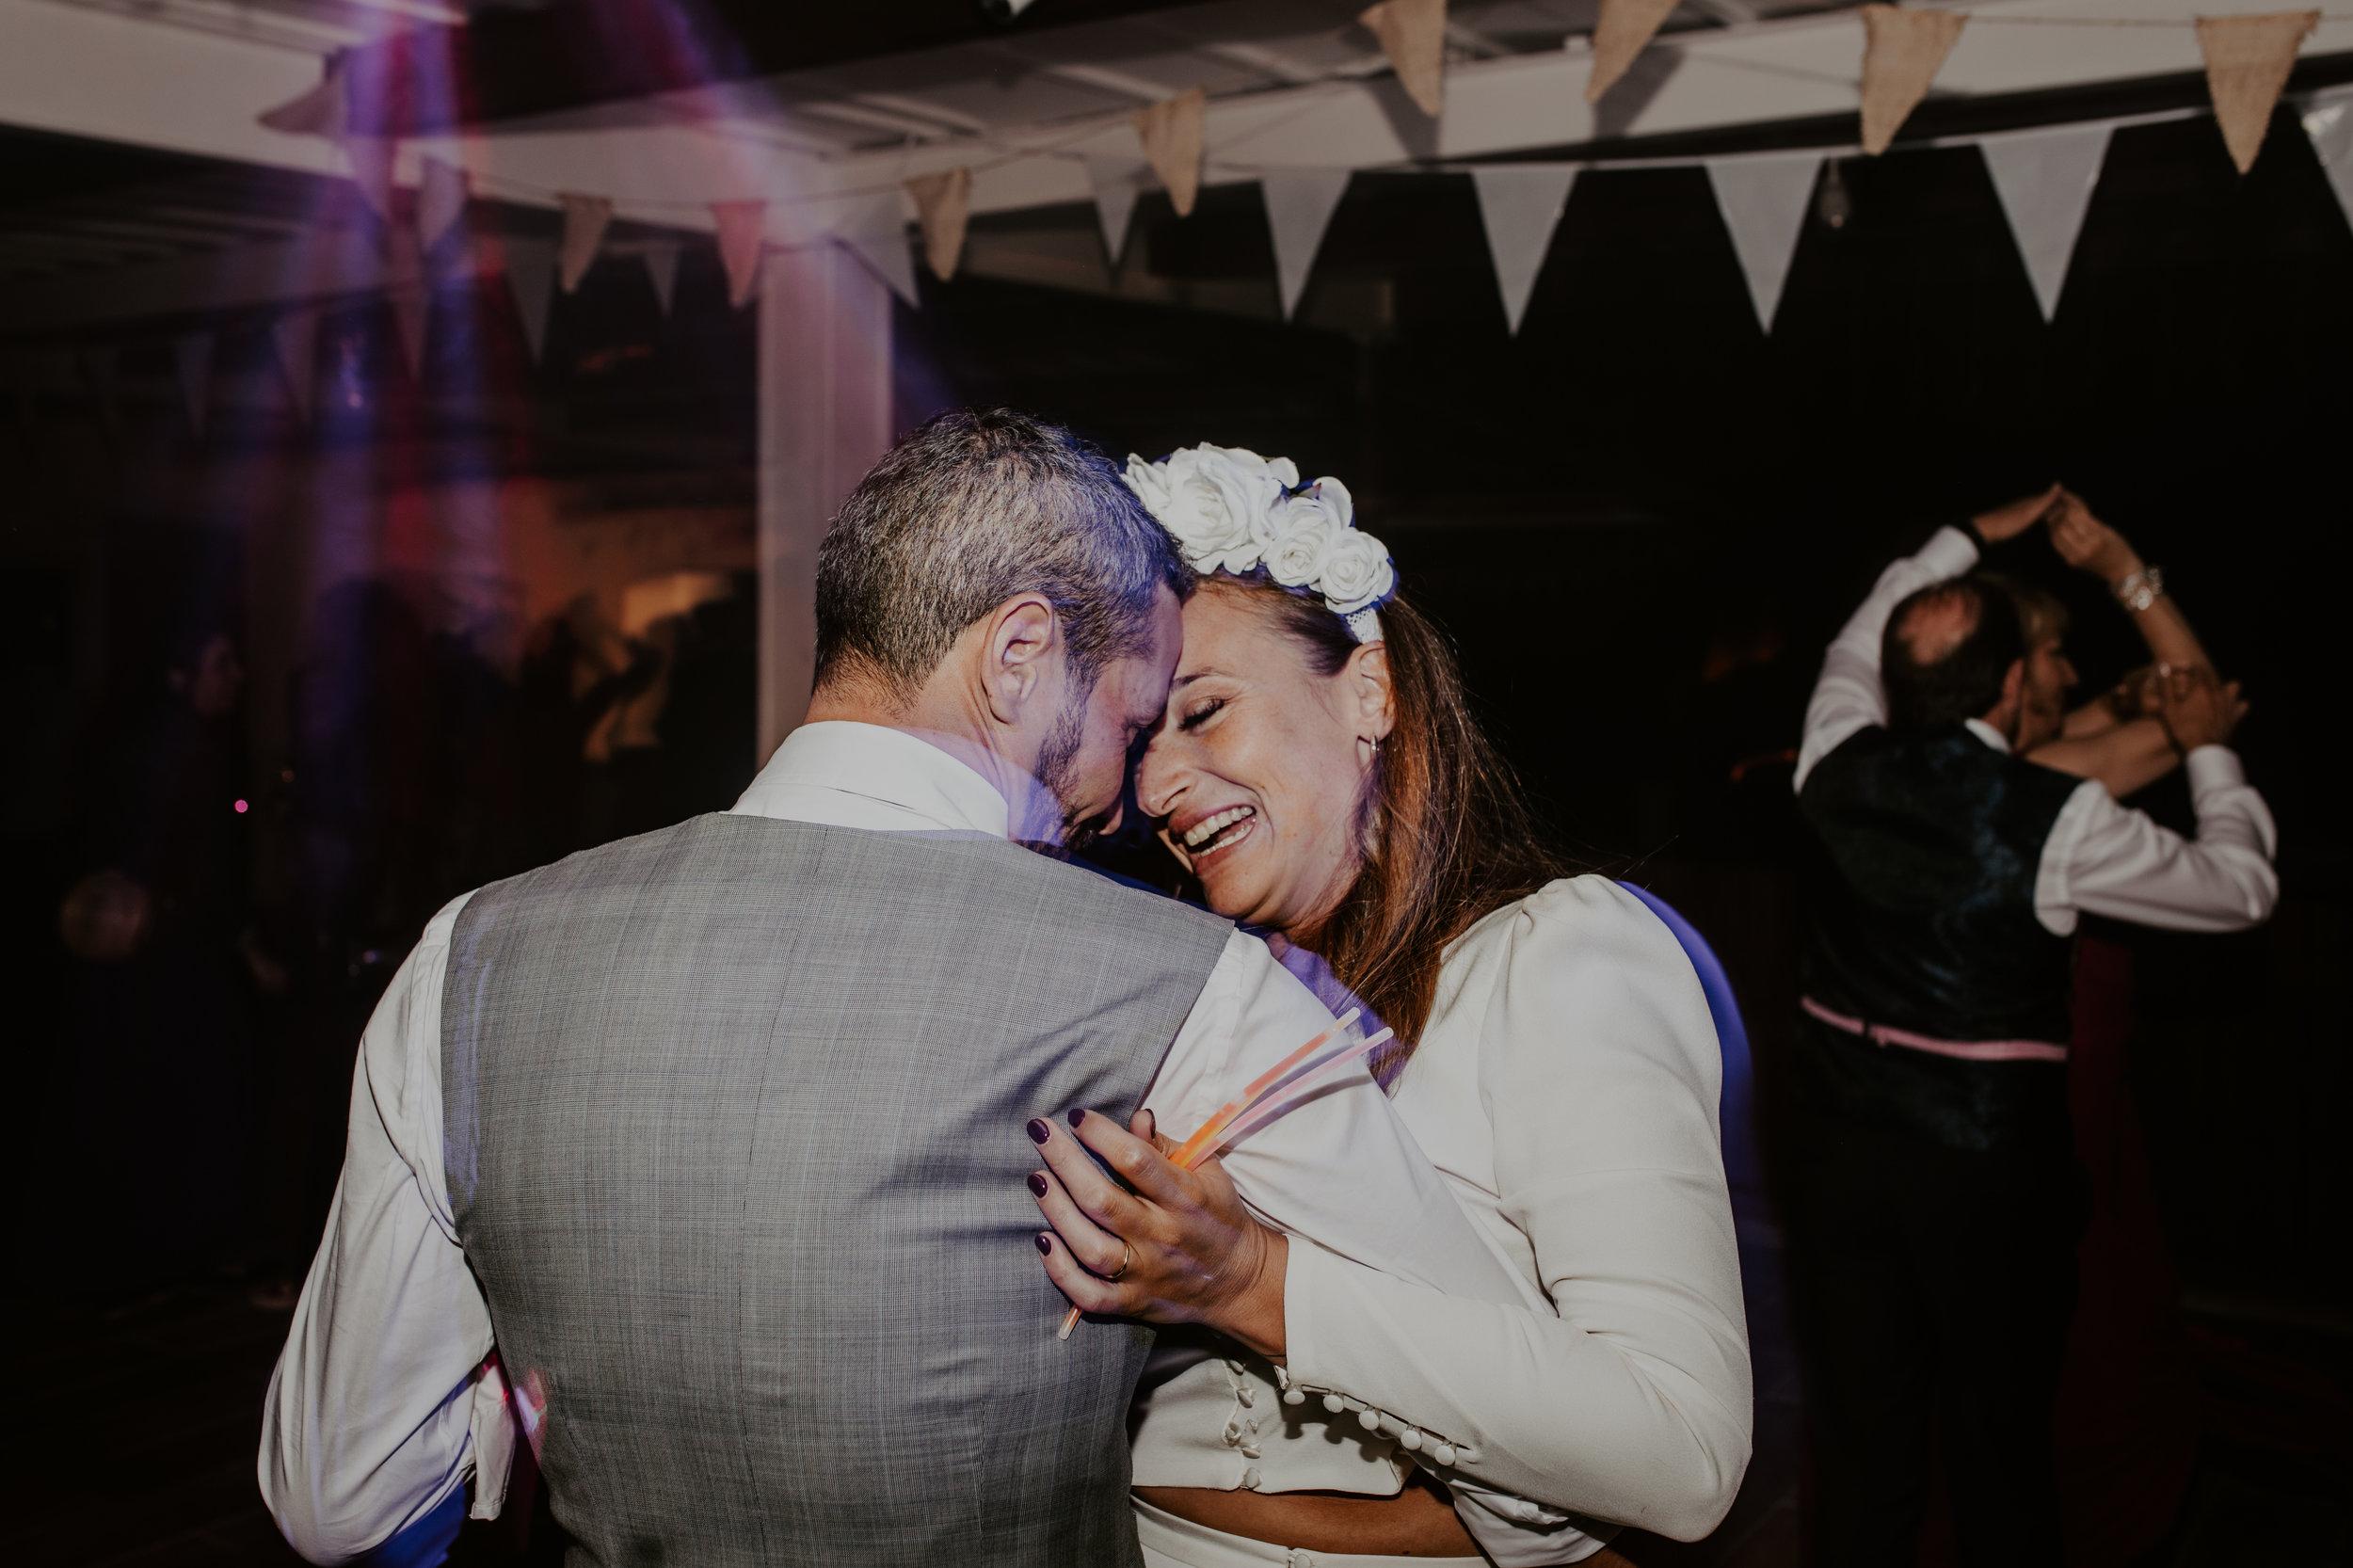 thenortherngirlphotography-fotografa-de-bodas-barcelona_destinartion-wedding-photographer_wedding-photographer_moroccan-wedding_HADNANANTIGONA-1558.jpg